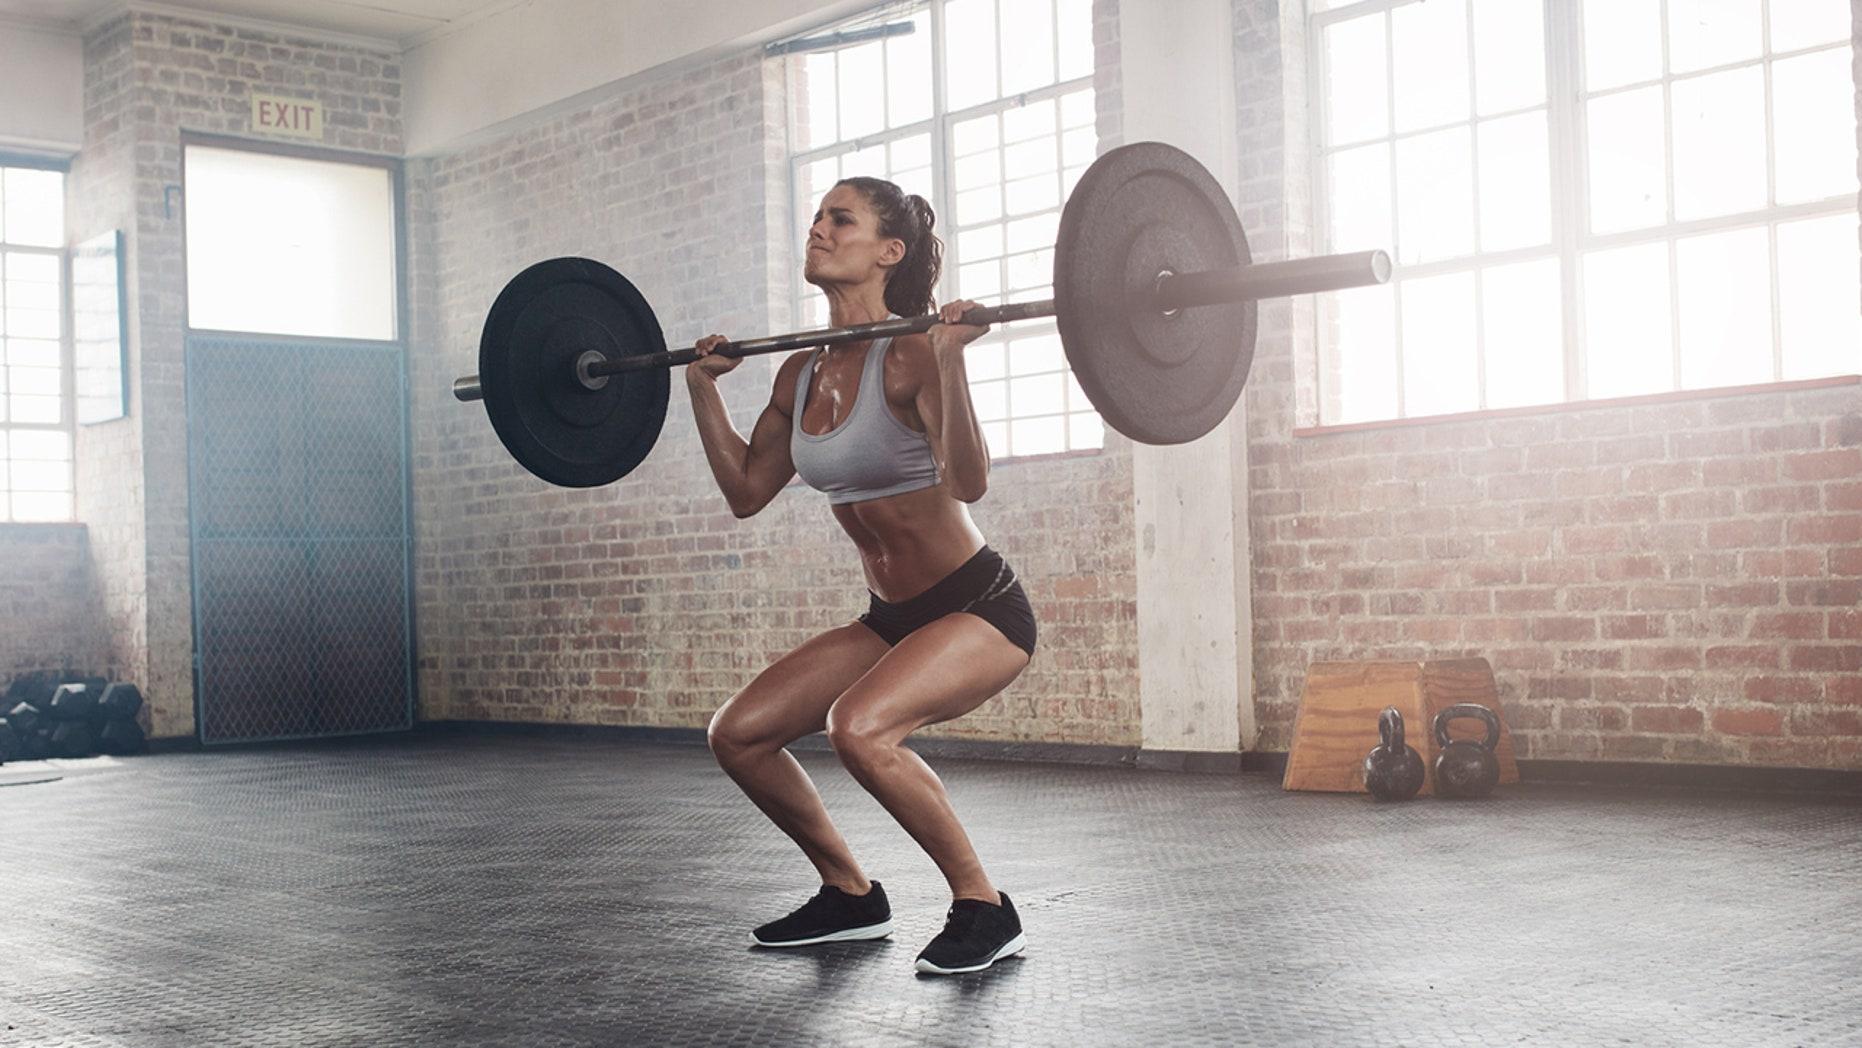 Fitness blogger Kelsey Wells promotes body positivity.